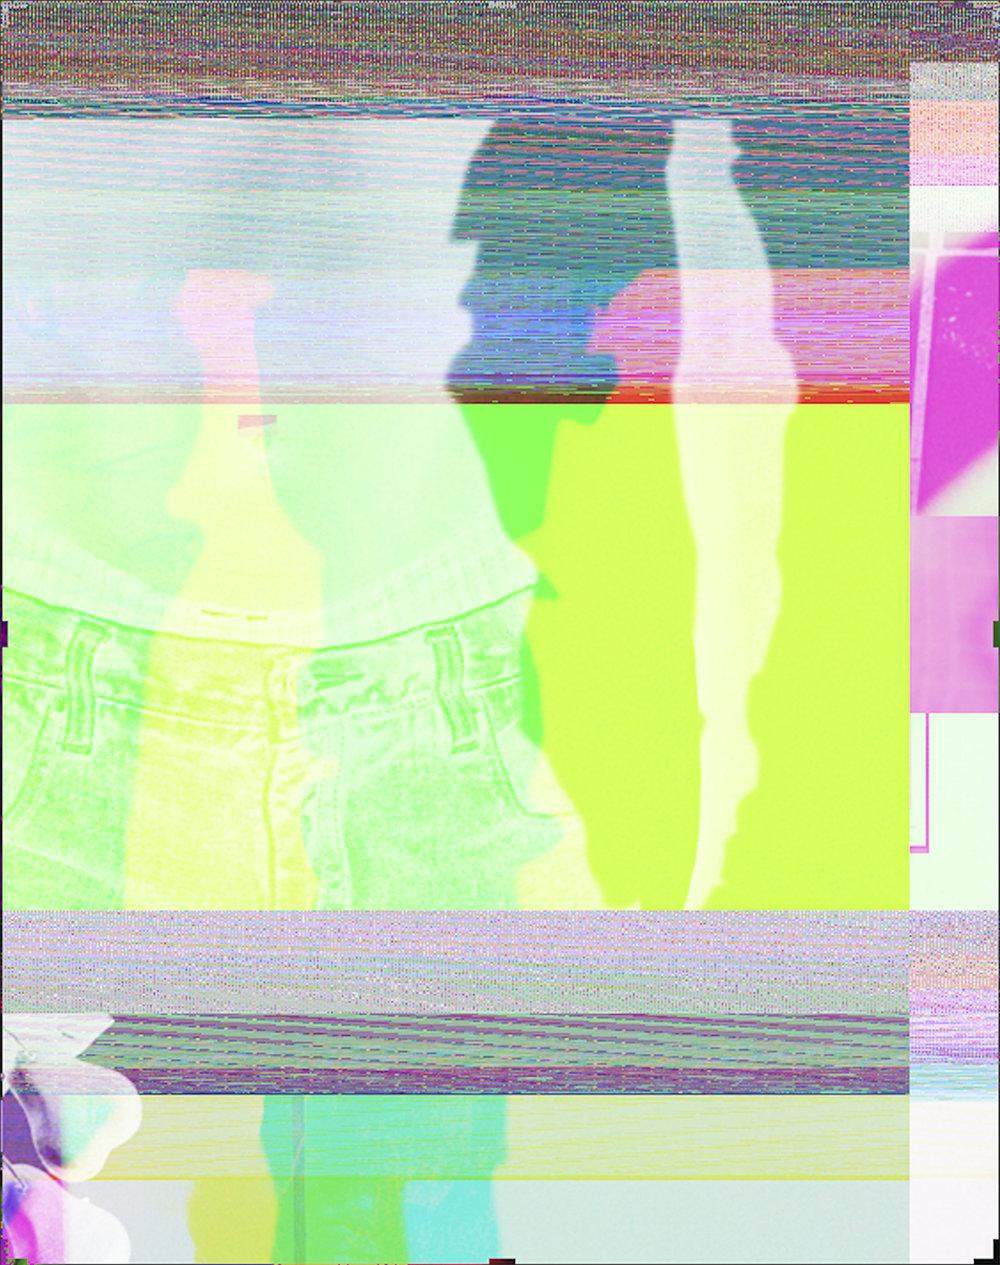 Untitled(10.04.34).jpg